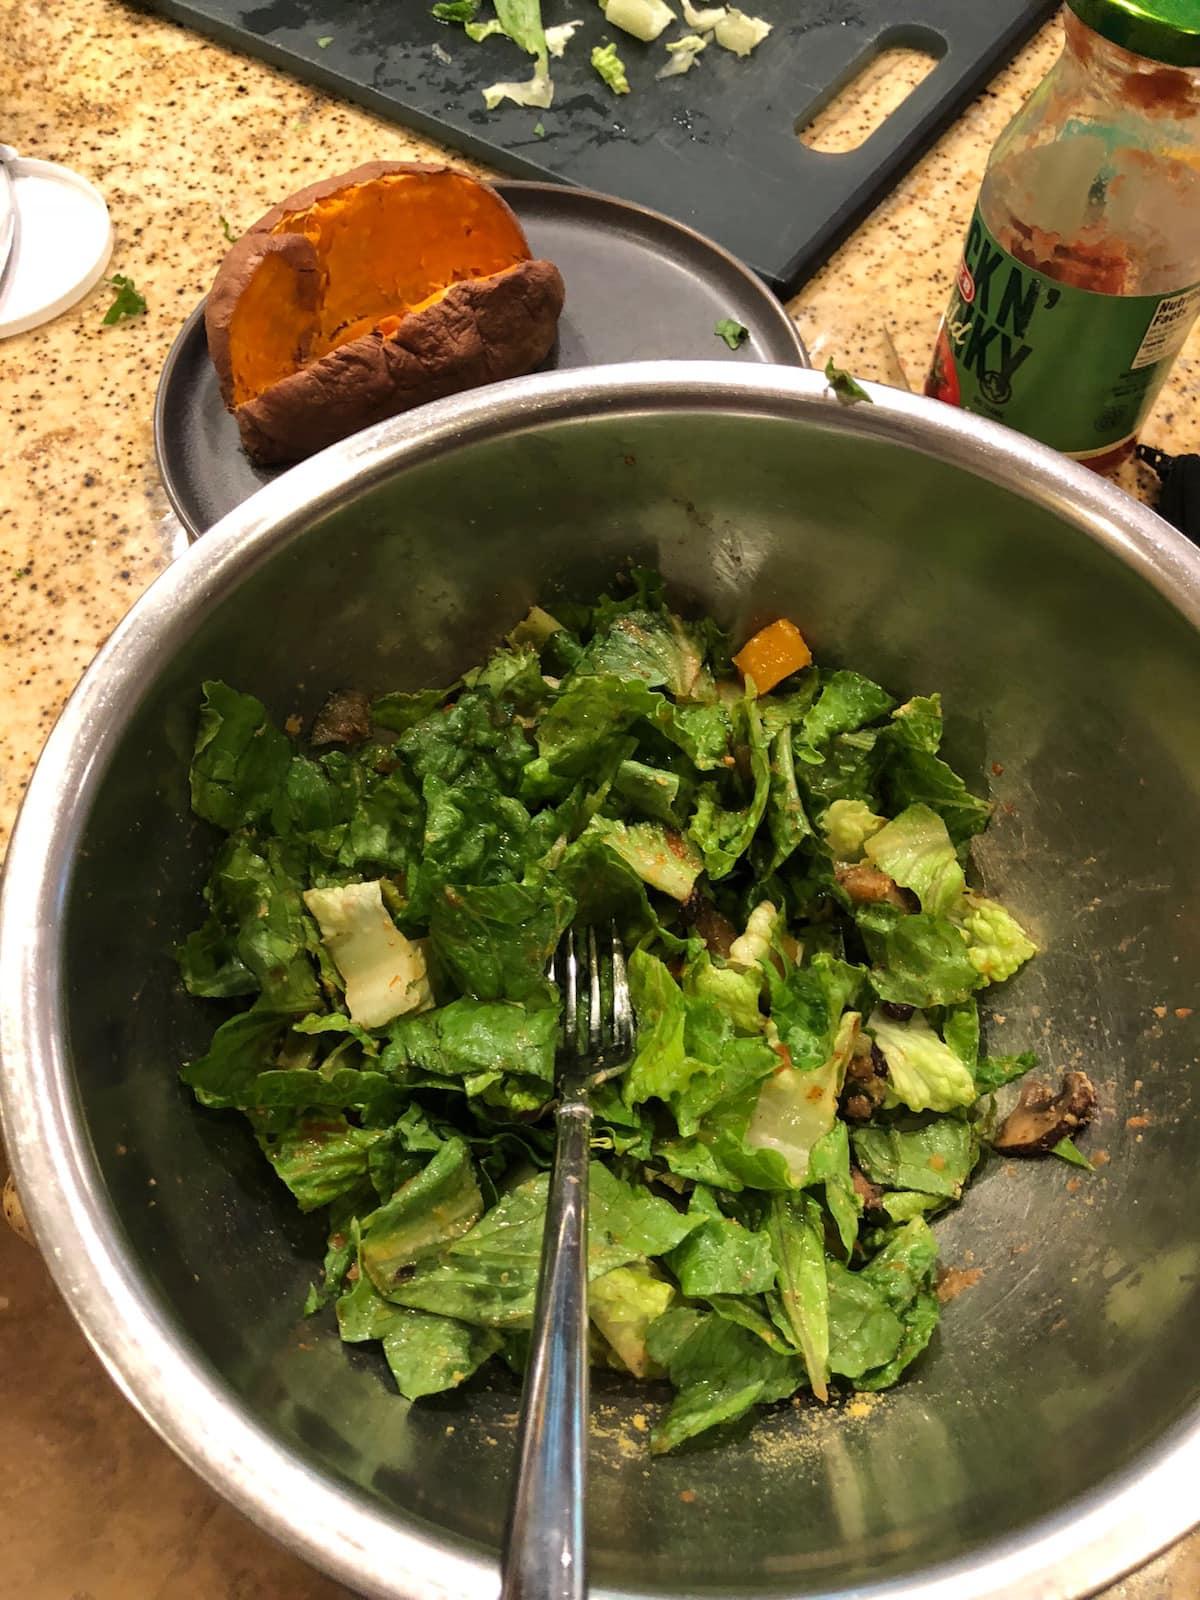 Vegan Meal Prep Ideas baked sweet potatoes